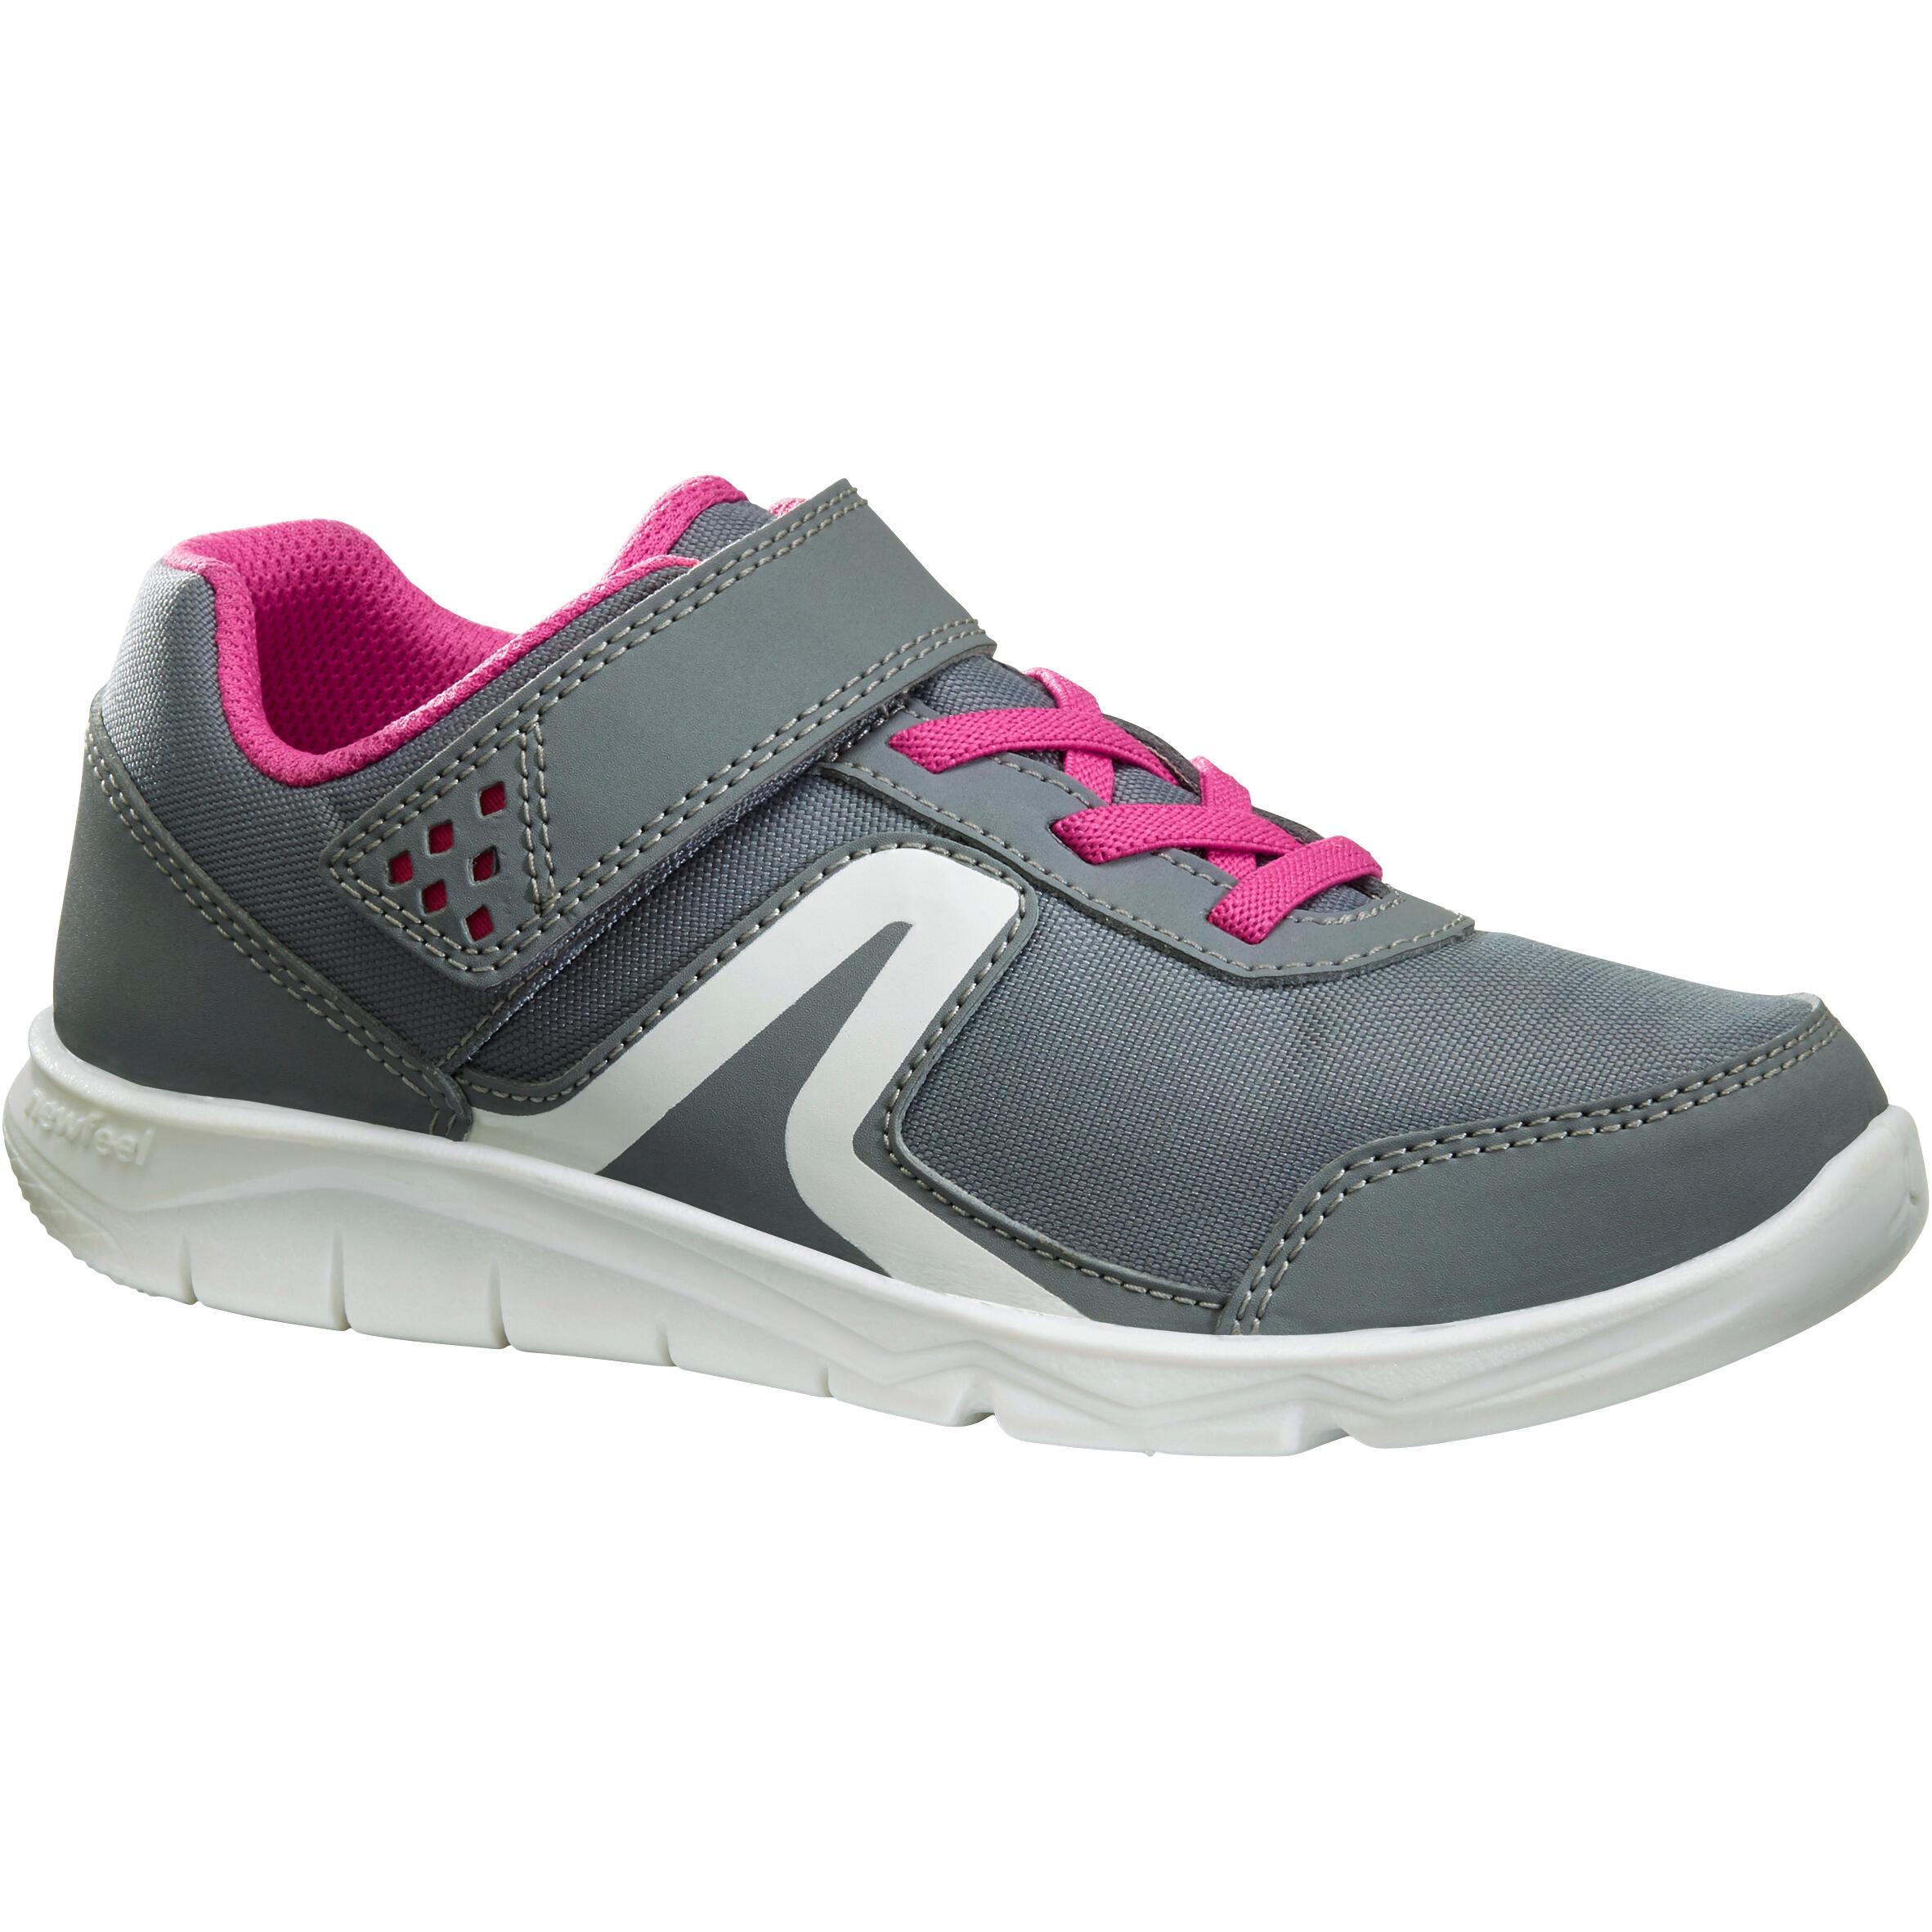 Tenis de caminata deportiva para niños PW 100 gris / rosa